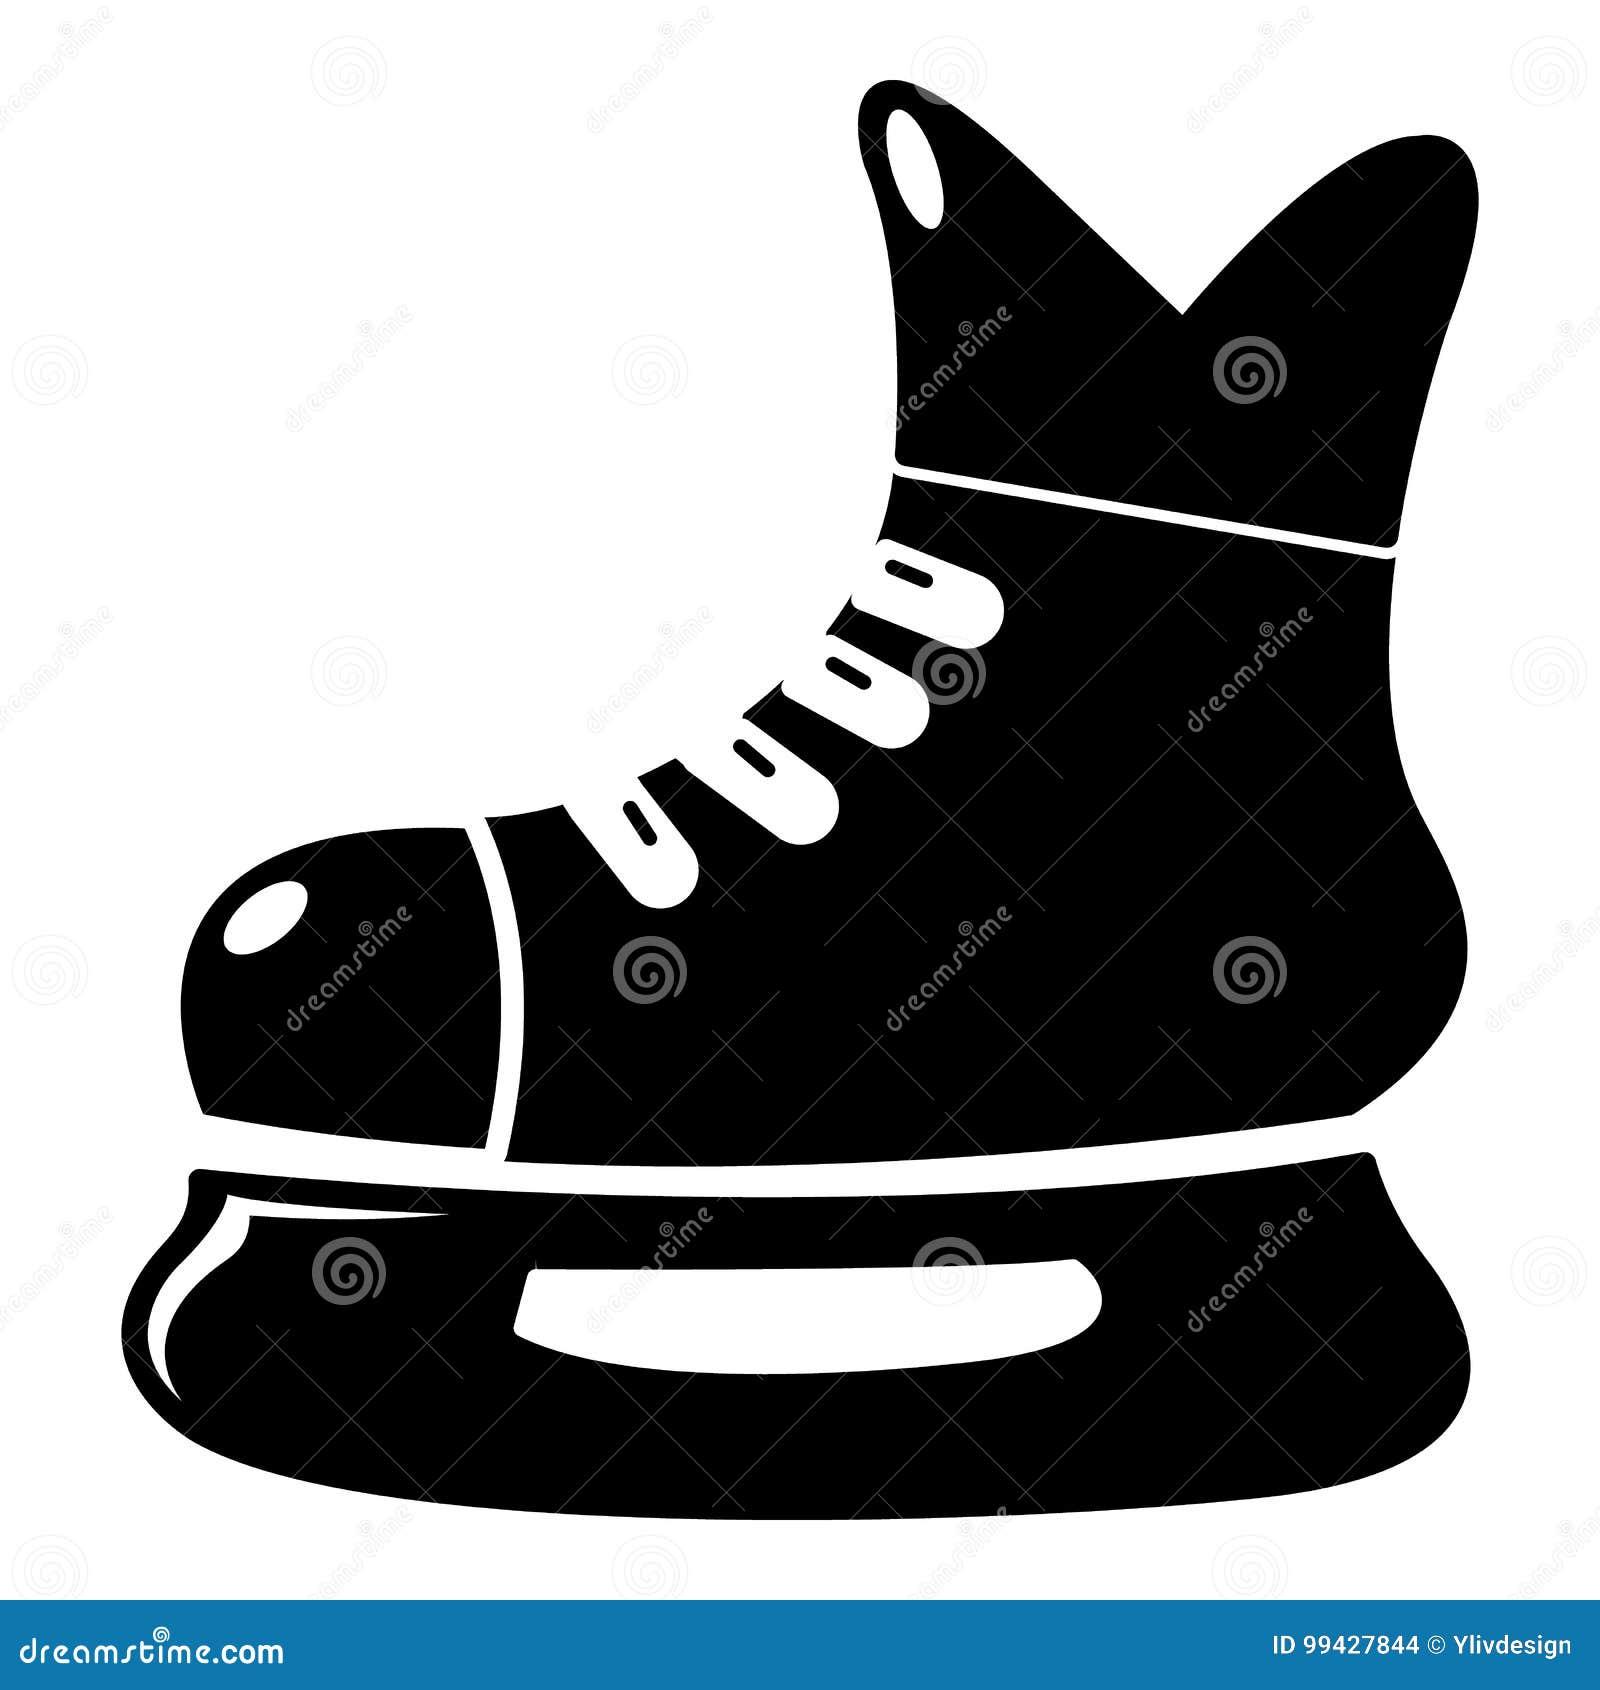 ic ne de patin de hockey sur glace style simple. Black Bedroom Furniture Sets. Home Design Ideas